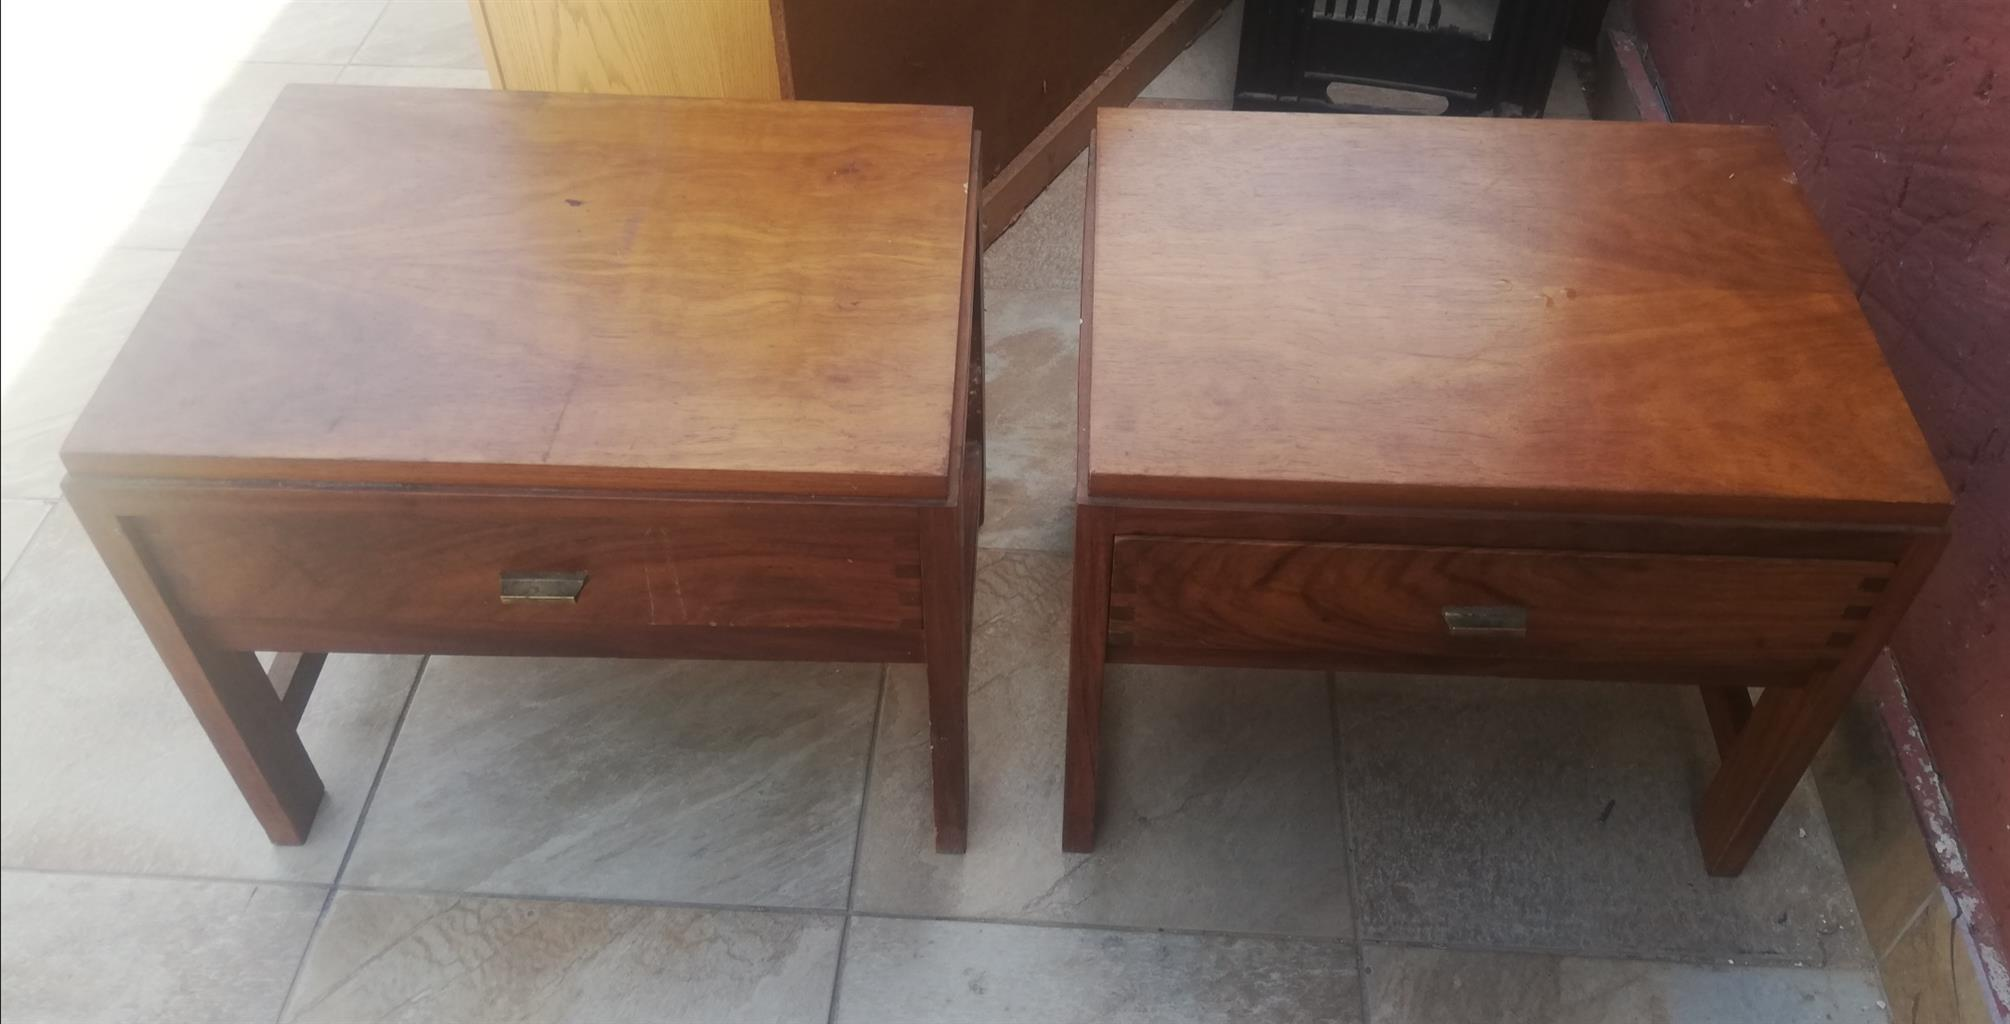 Set of two pedestals